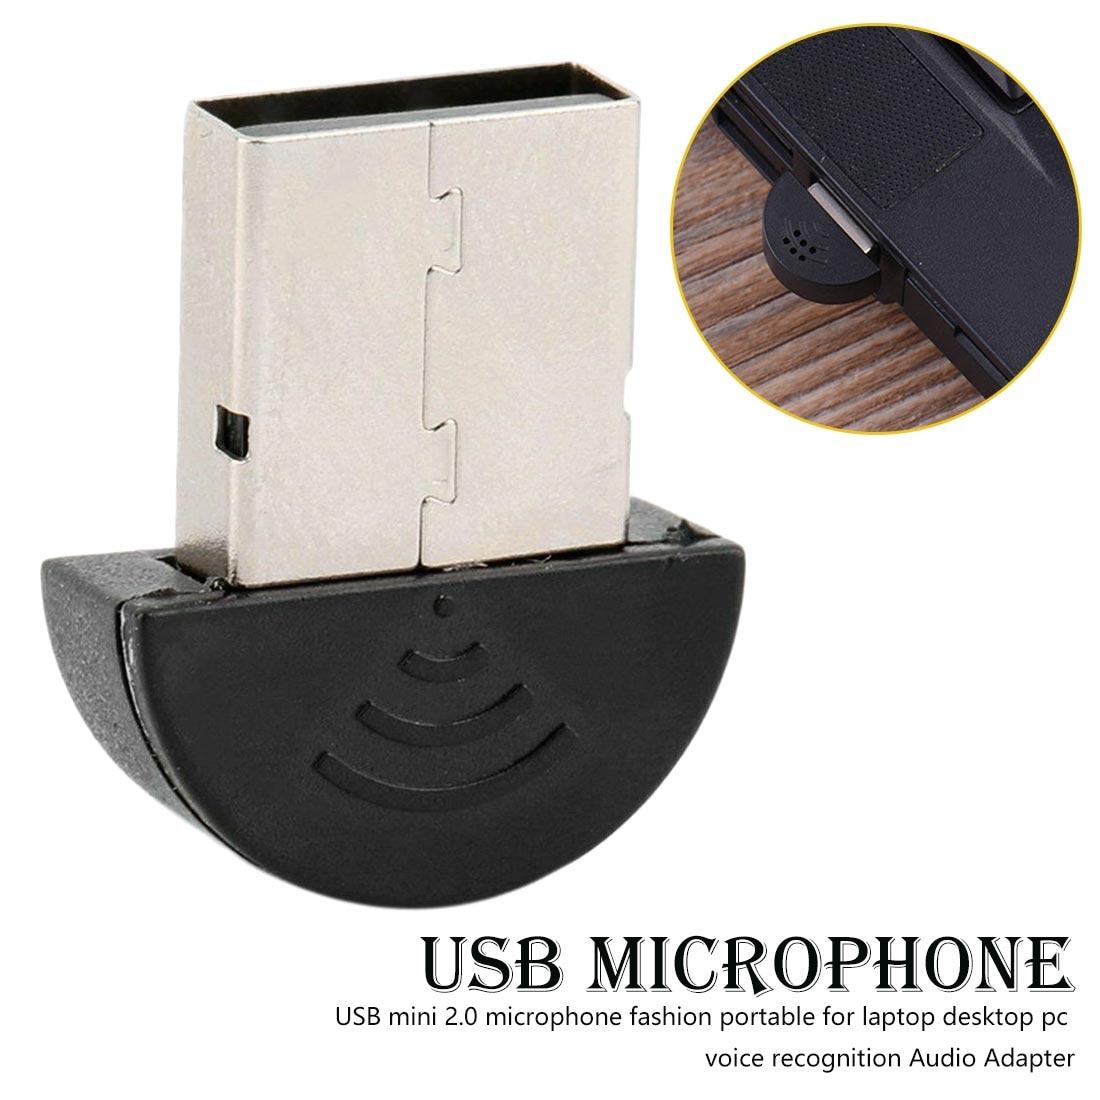 USB Microphone Mini 2.0 Fashion Portable For Laptop Desktop Pc Voice Recognition Audio Adapter Microphone Karaoke